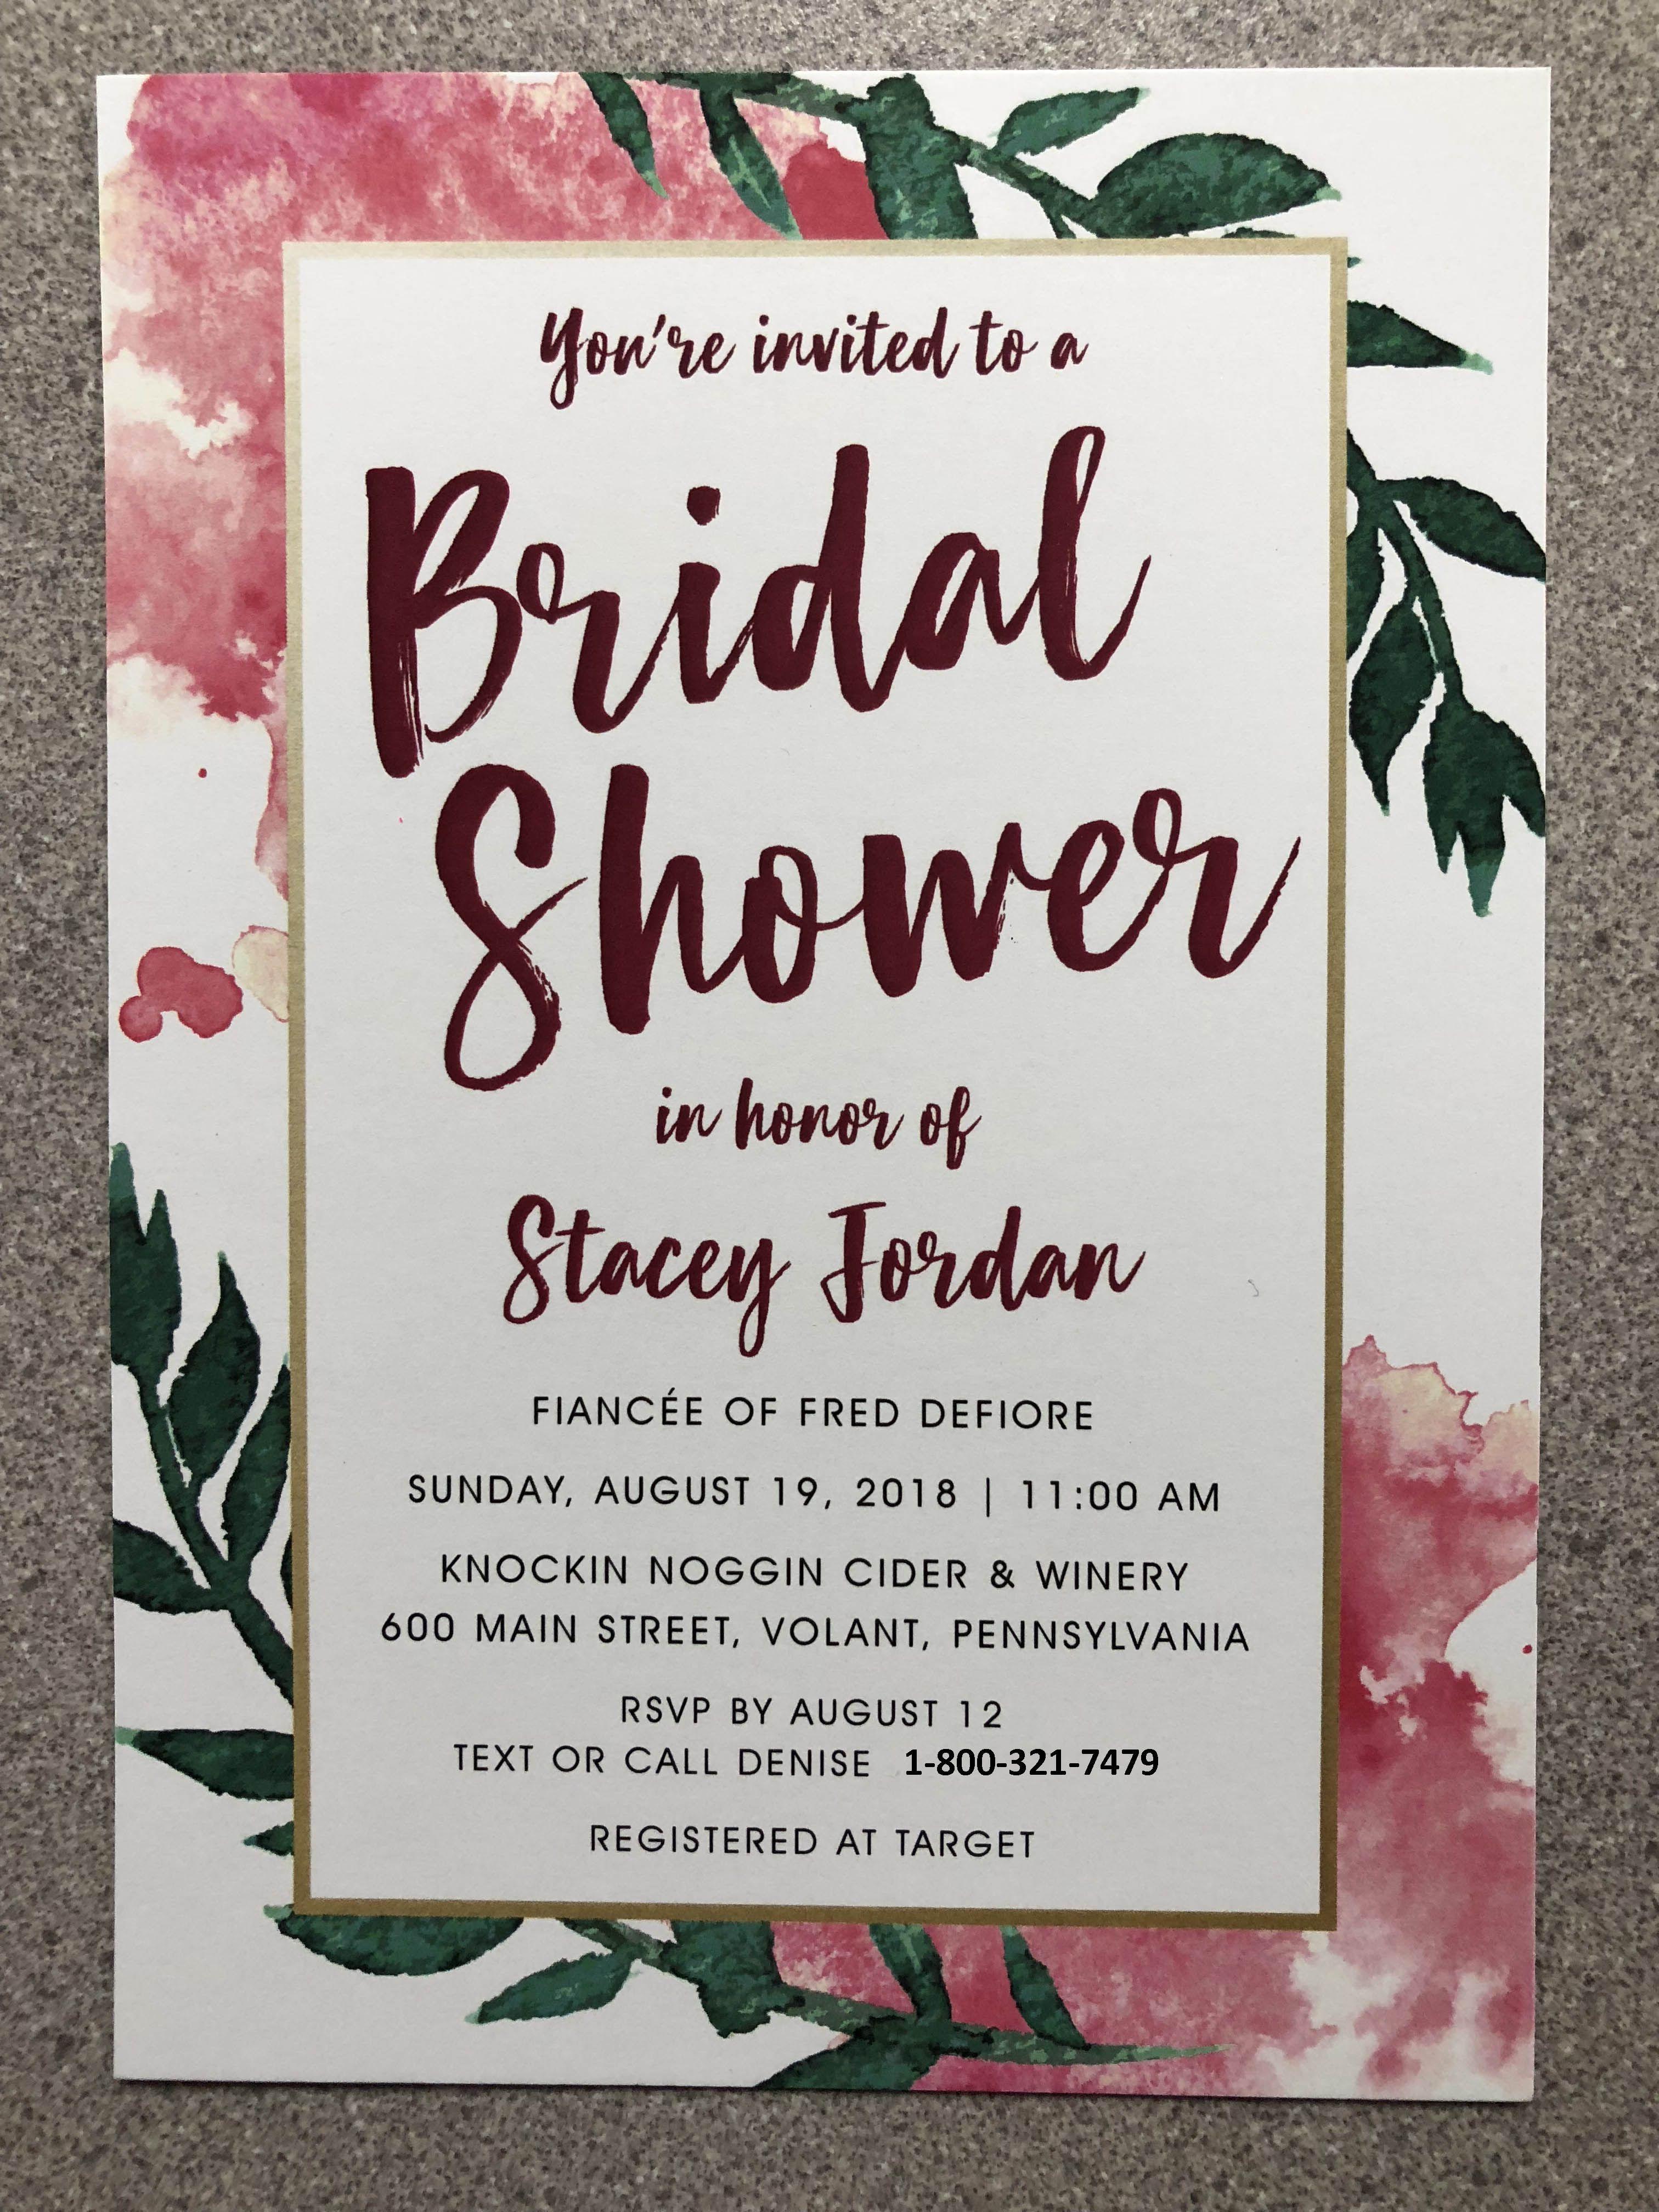 custom bridal shower invitation from boardman printing